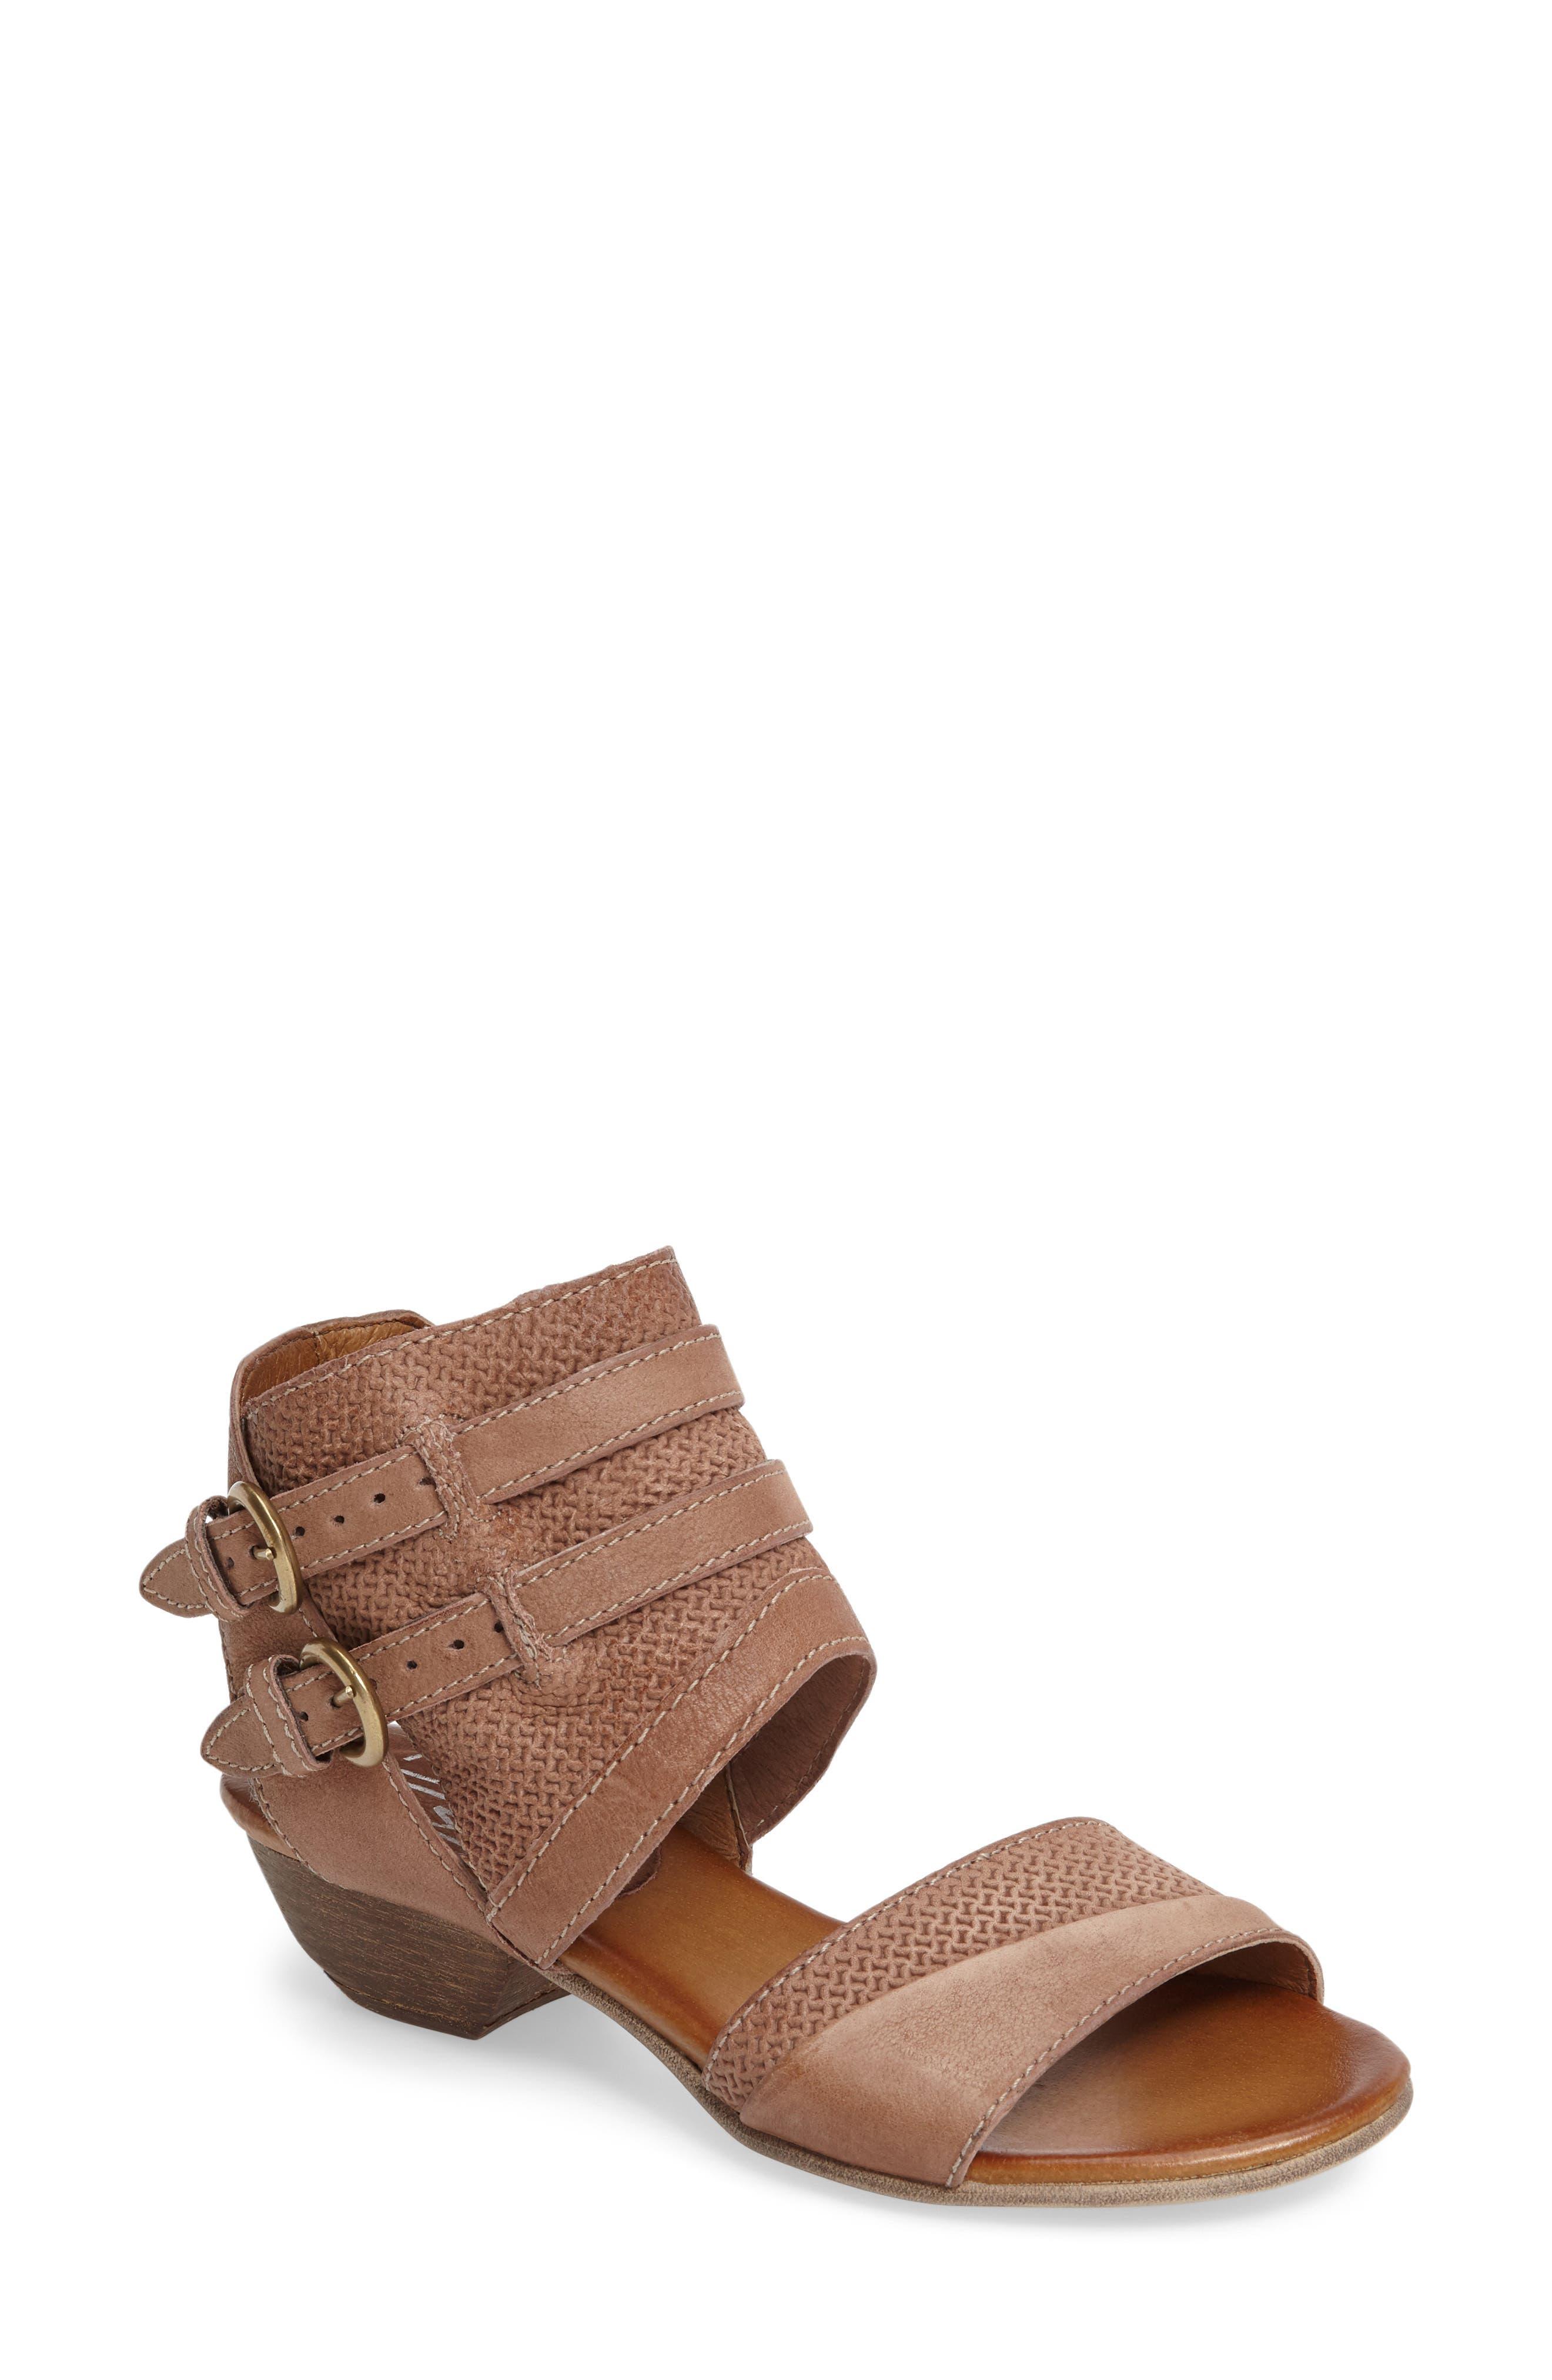 Miz Mooz 'Cyrus' Sandal (Women)